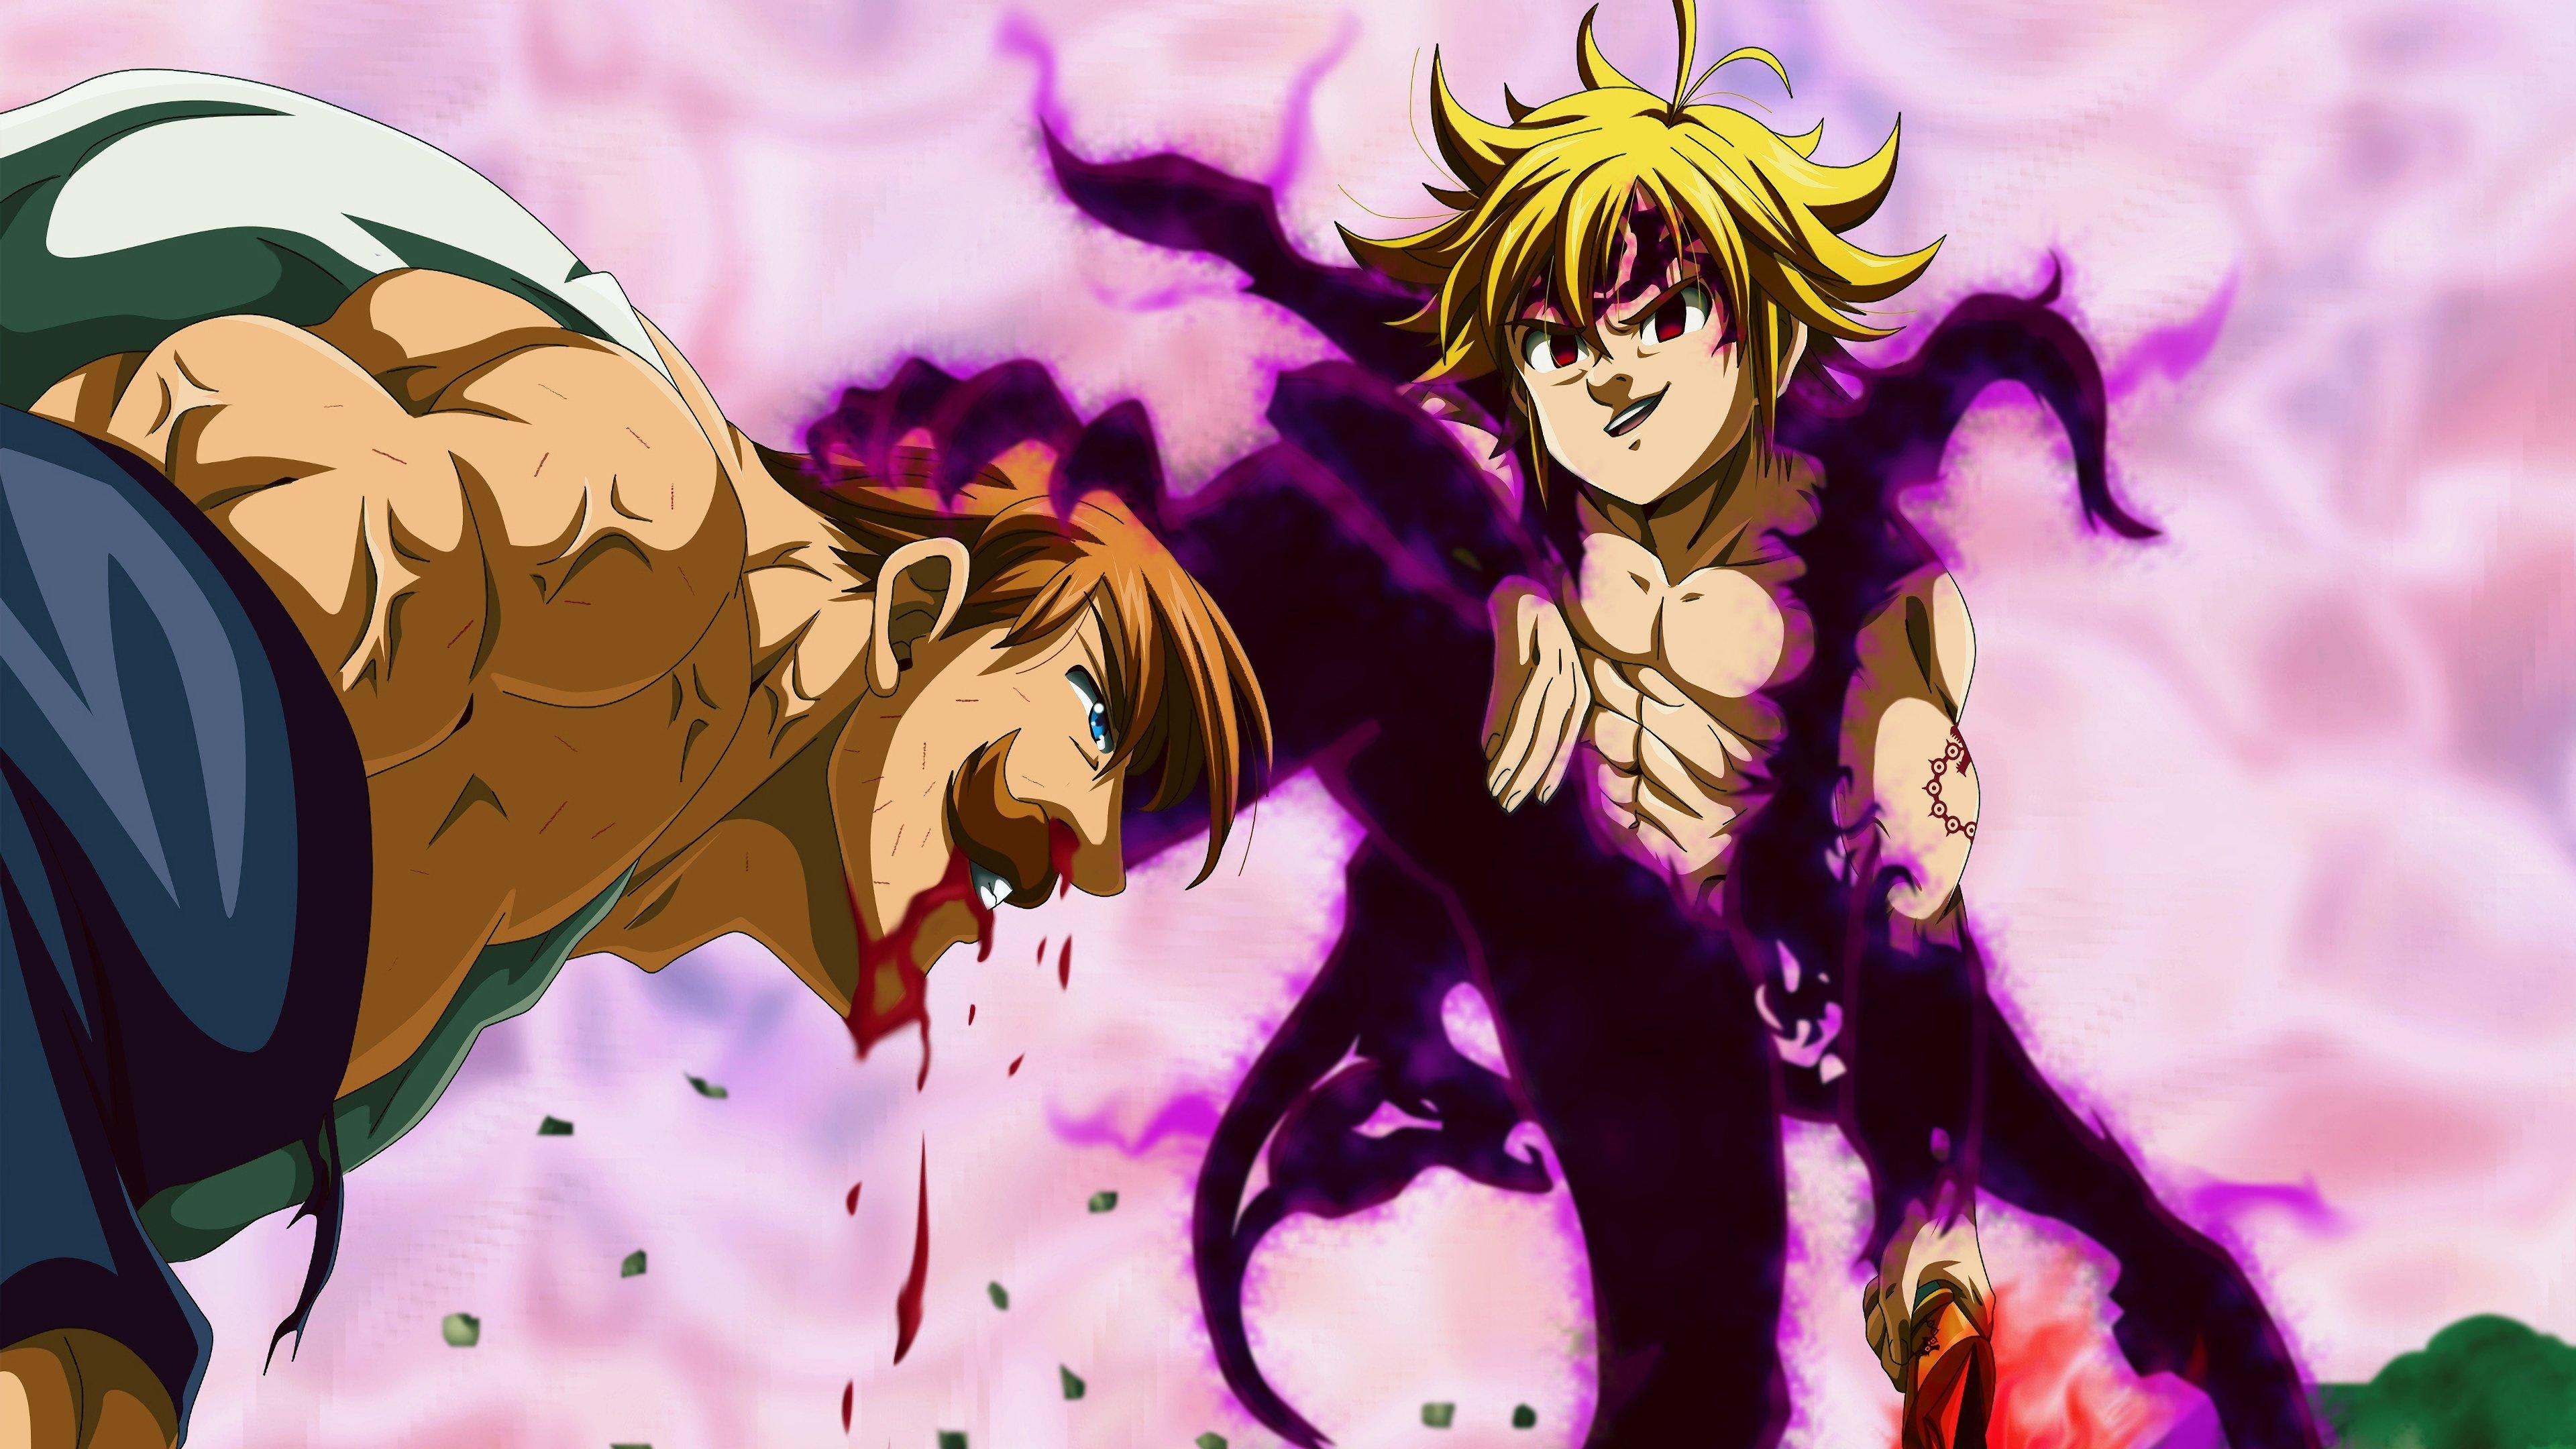 Anime Wallpaper Scene from Seven Deadly Sins